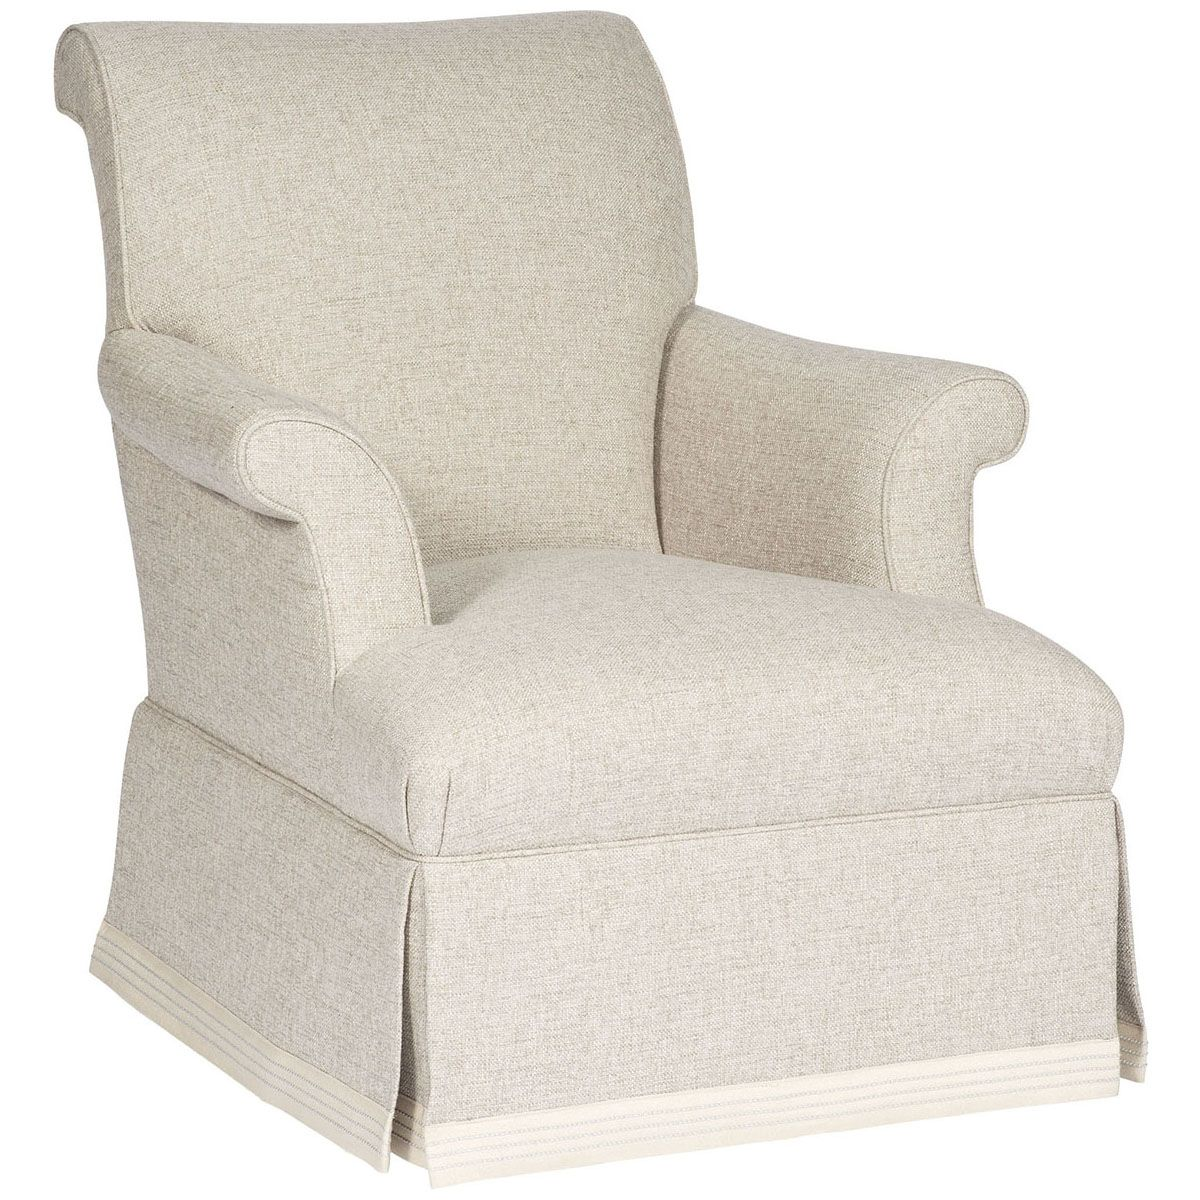 Vanguard Furniture Preyer Chair V242D-CH-152090